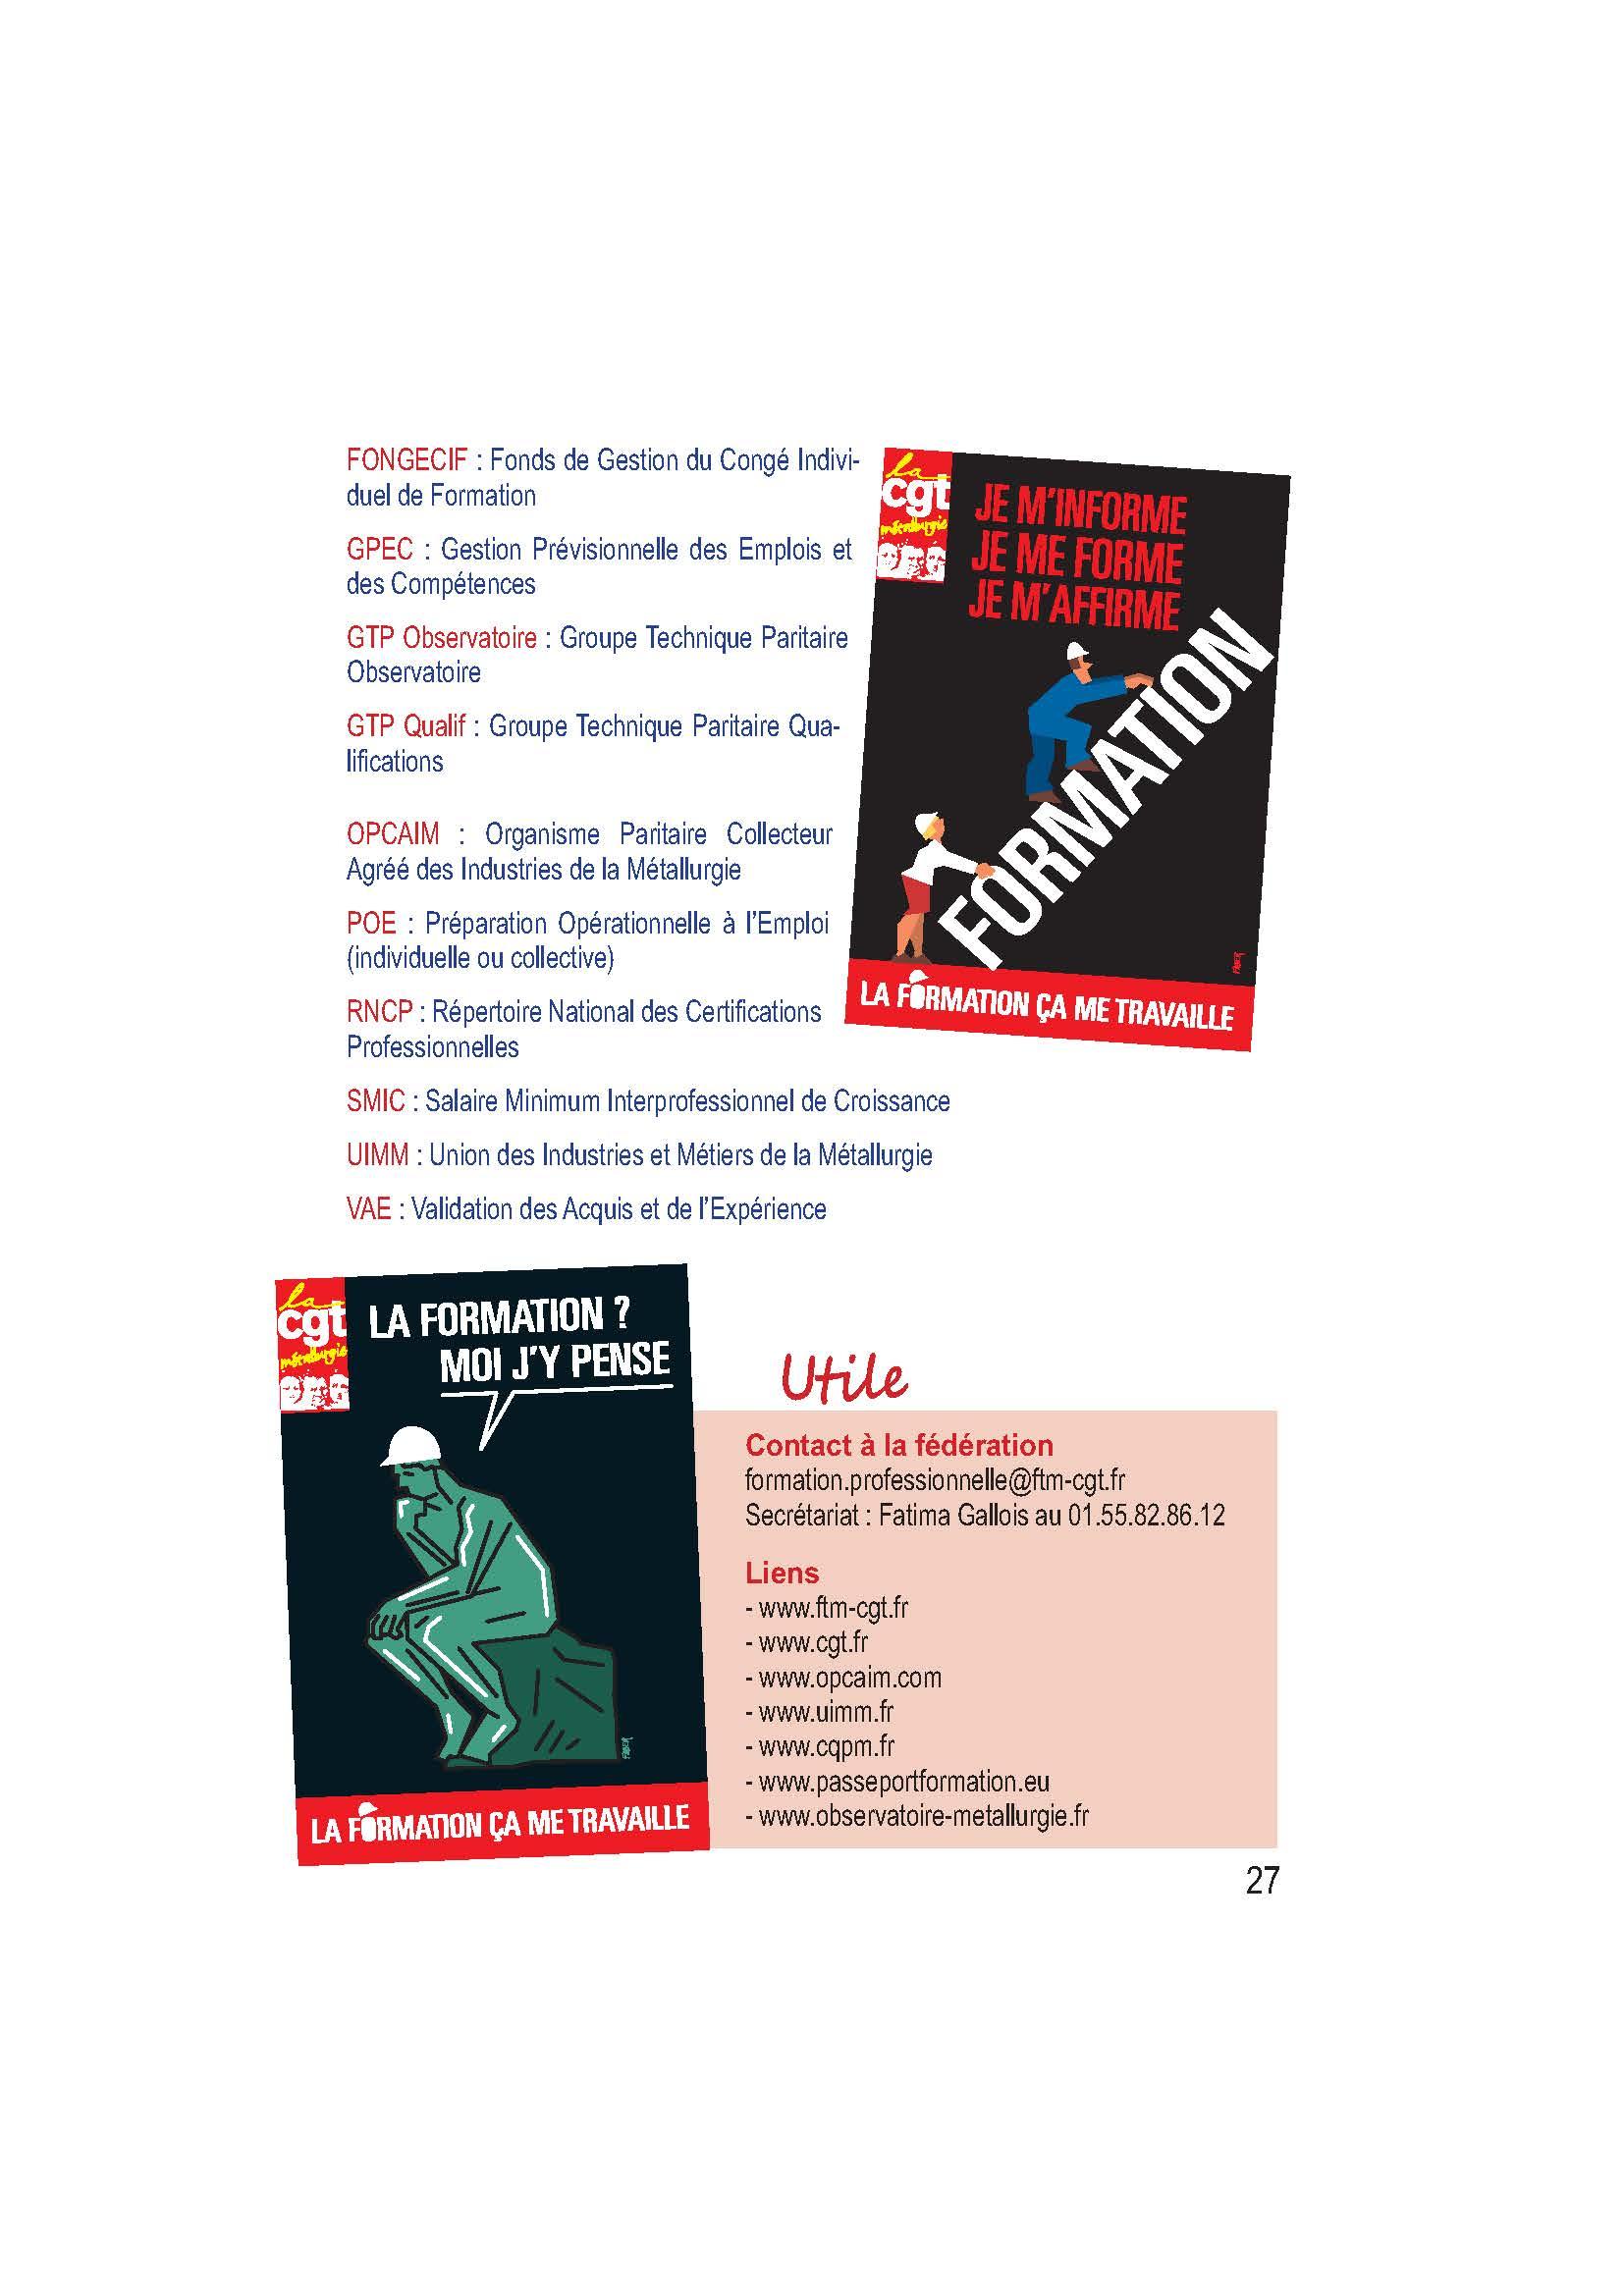 Livret Formation Professionelle_Page_27